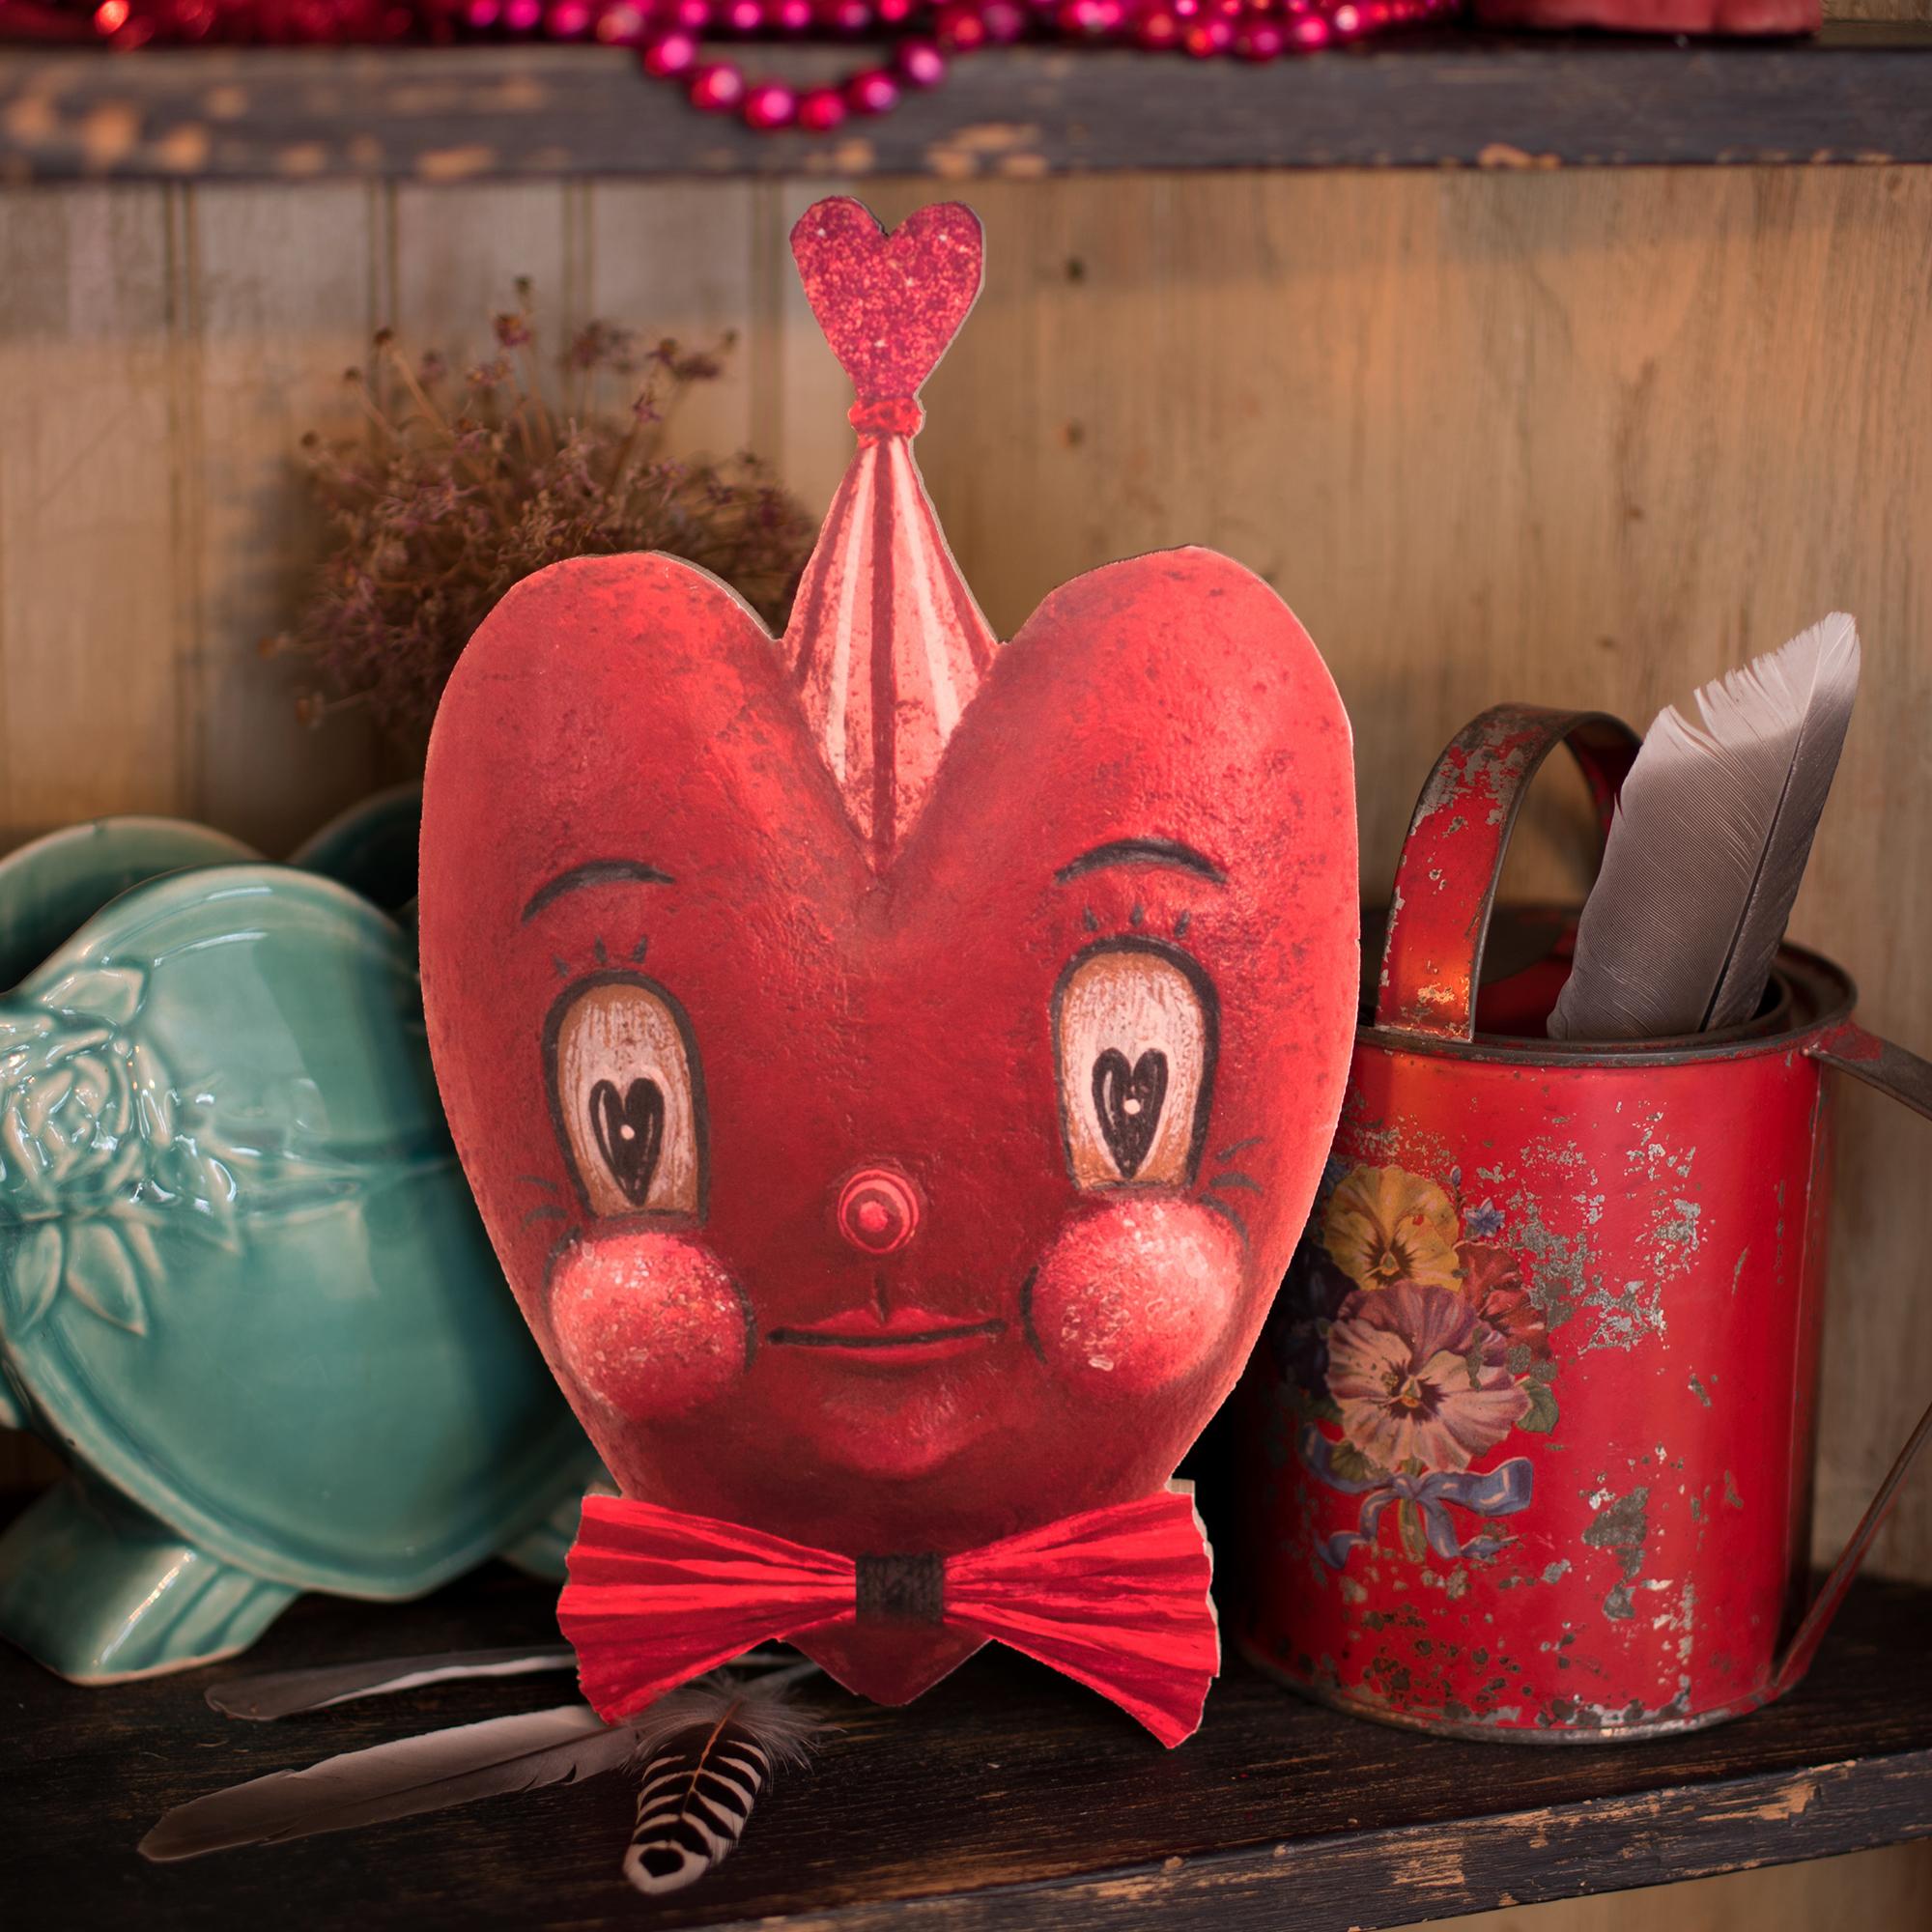 JPD Partners in Craft * The Sawmill Shop + Johanna Parker Design * Artist Collaboration